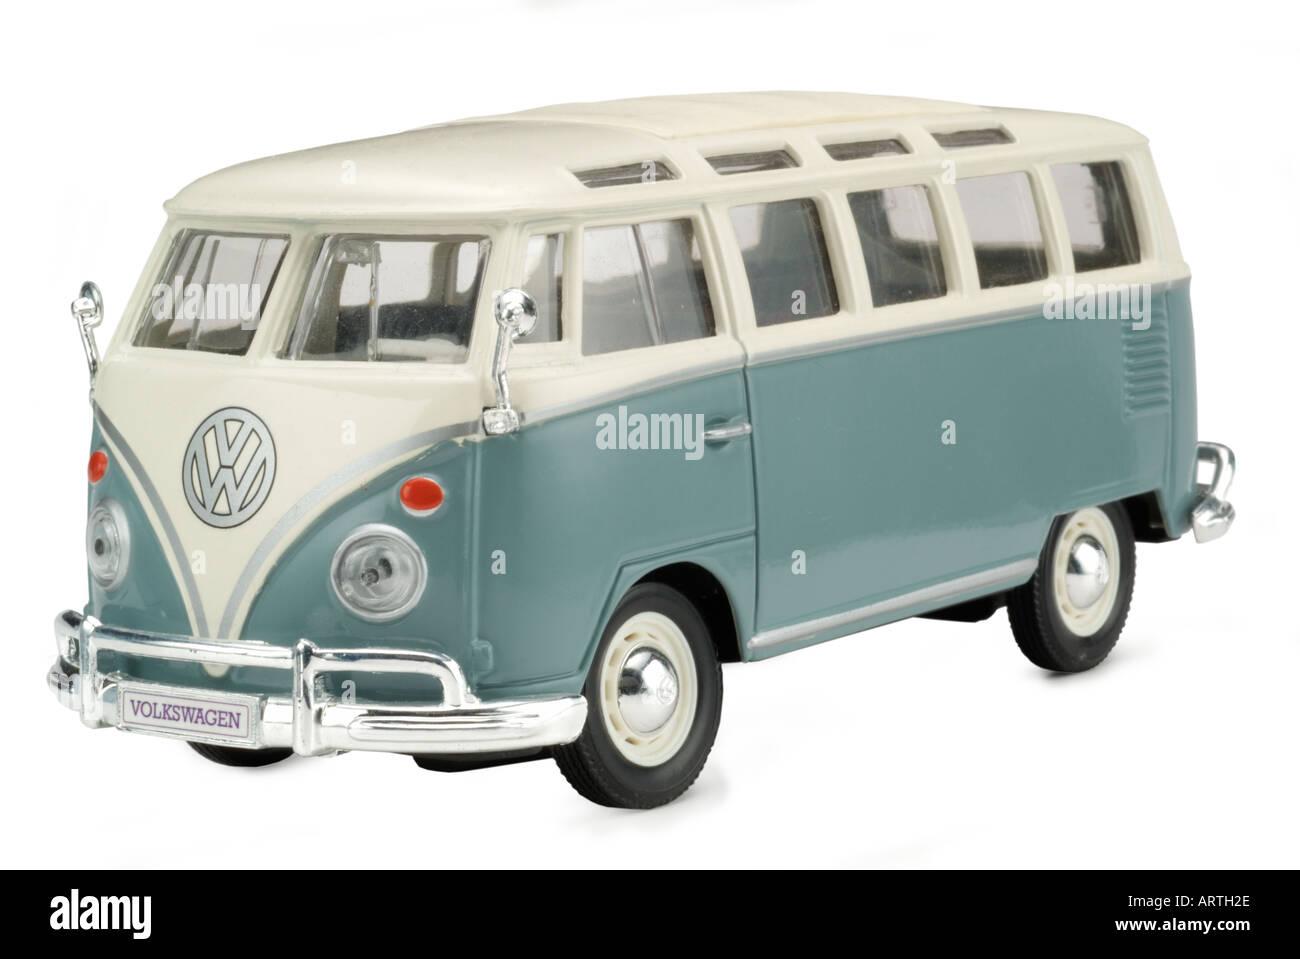 Vw camper van toy model - Stock Image